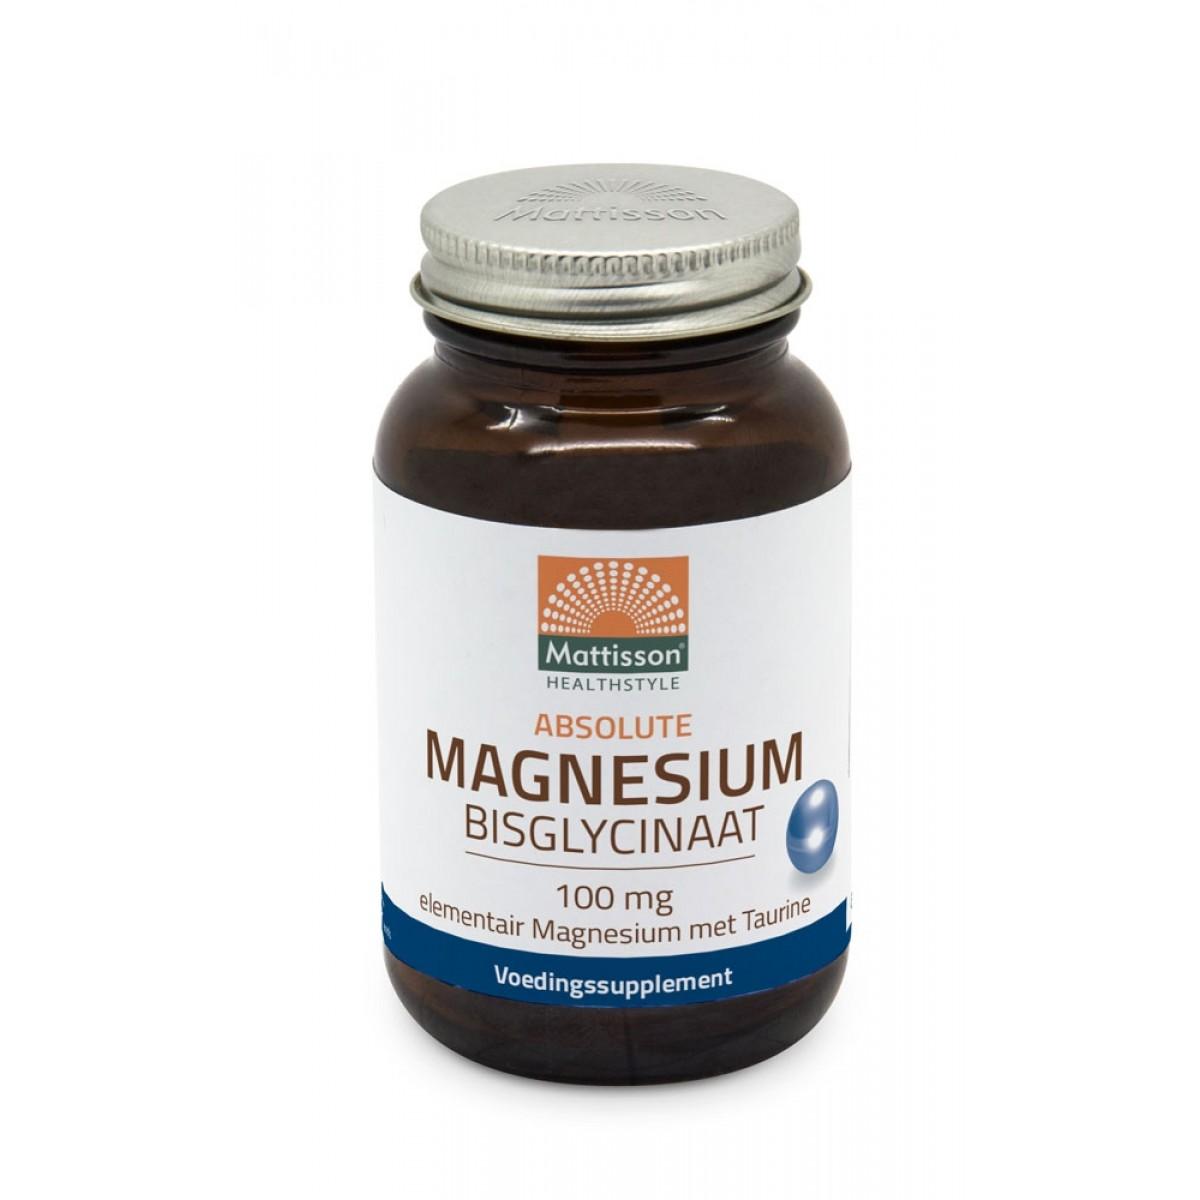 Magnesium Bisglycinaat 100 mg Taurine